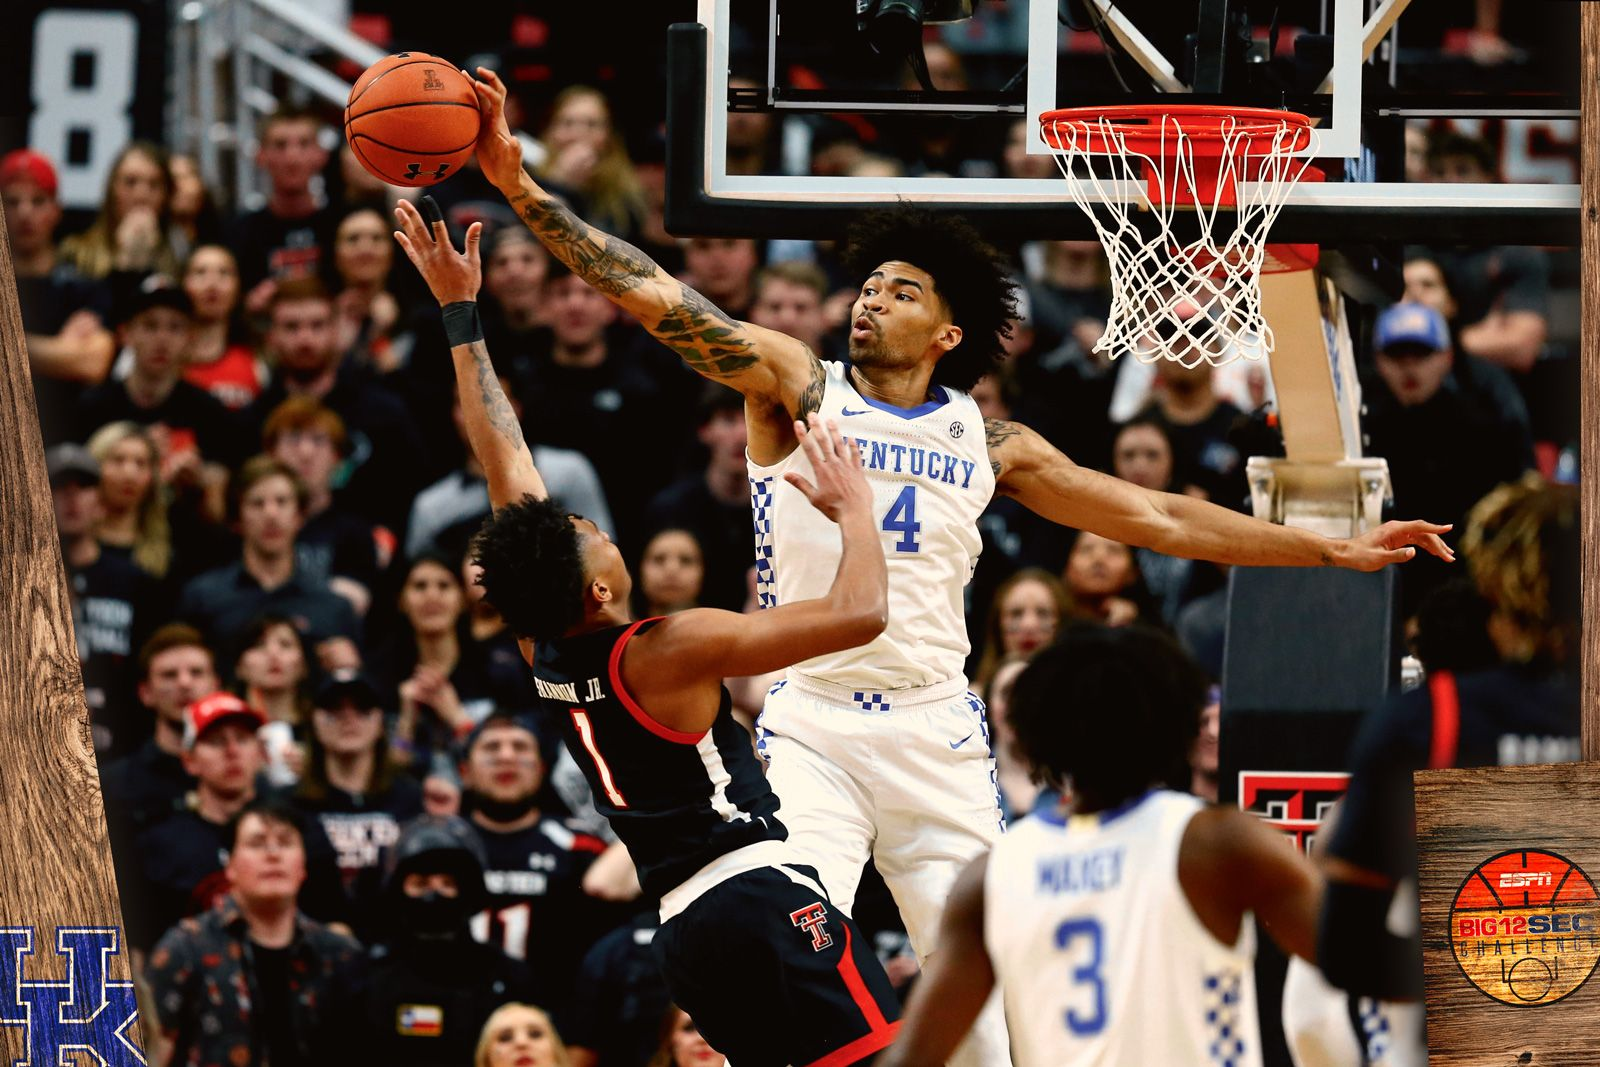 Kentucky Basketball On Twitter In 2020 Kentucky Athletics Kentucky Basketball University Of Kentucky